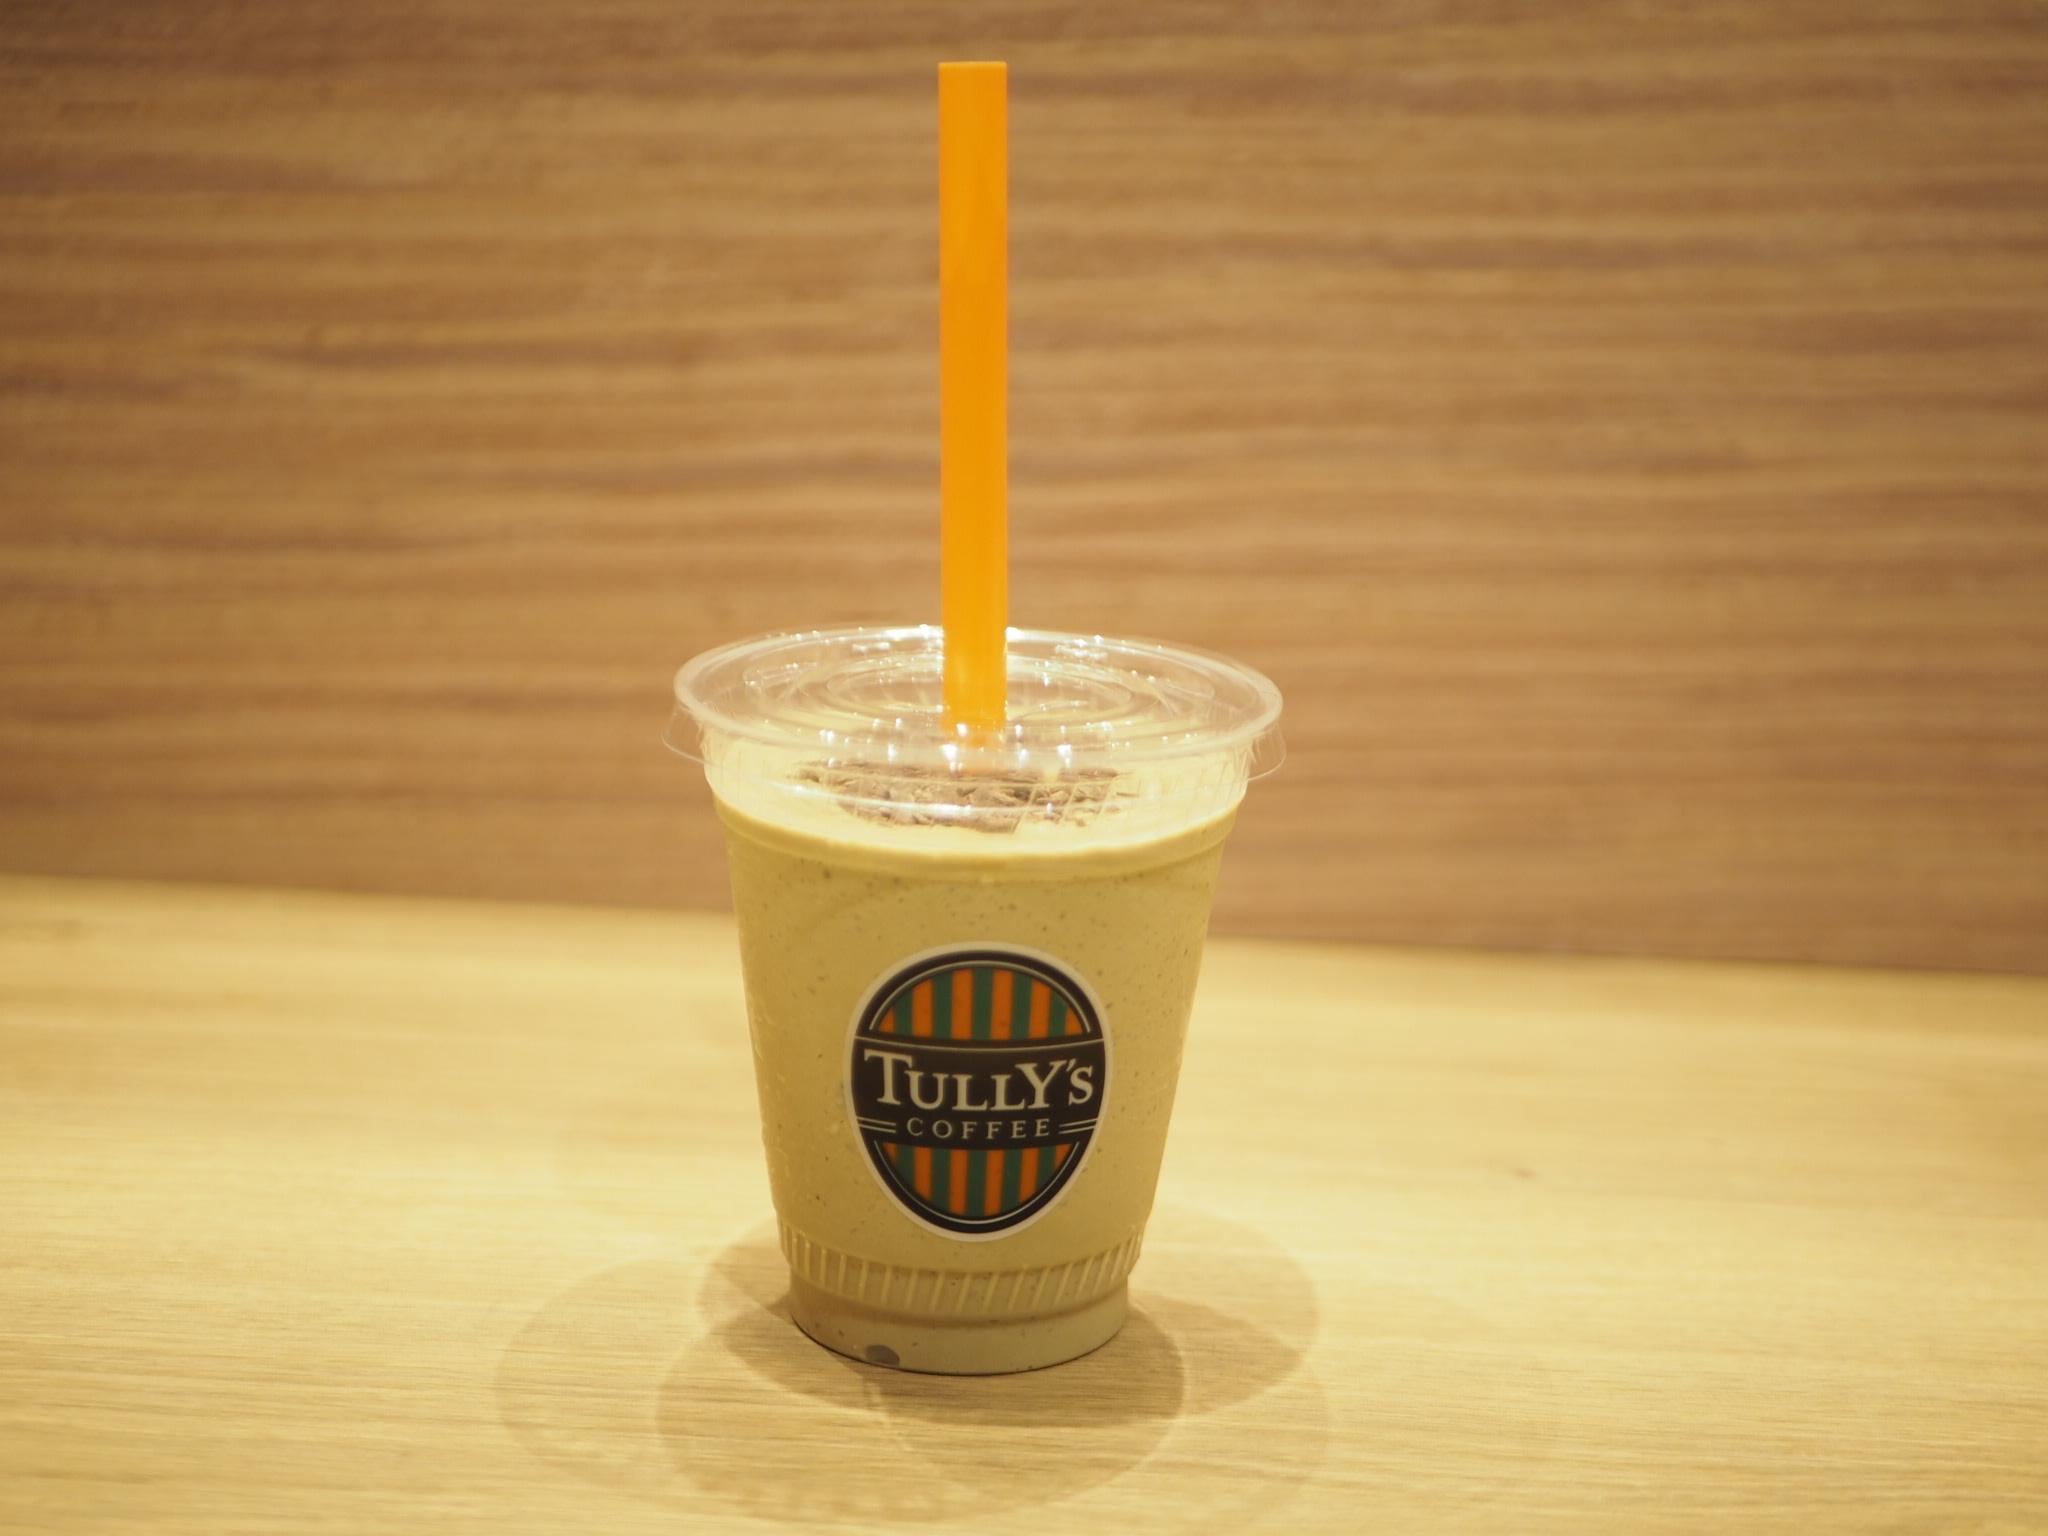 【TULLY'S COFFEE】濃厚フローズンドリンク「抹茶リスタ」&「ほうじ茶リスタ」が待望のレギュラーメニューに❤︎_3